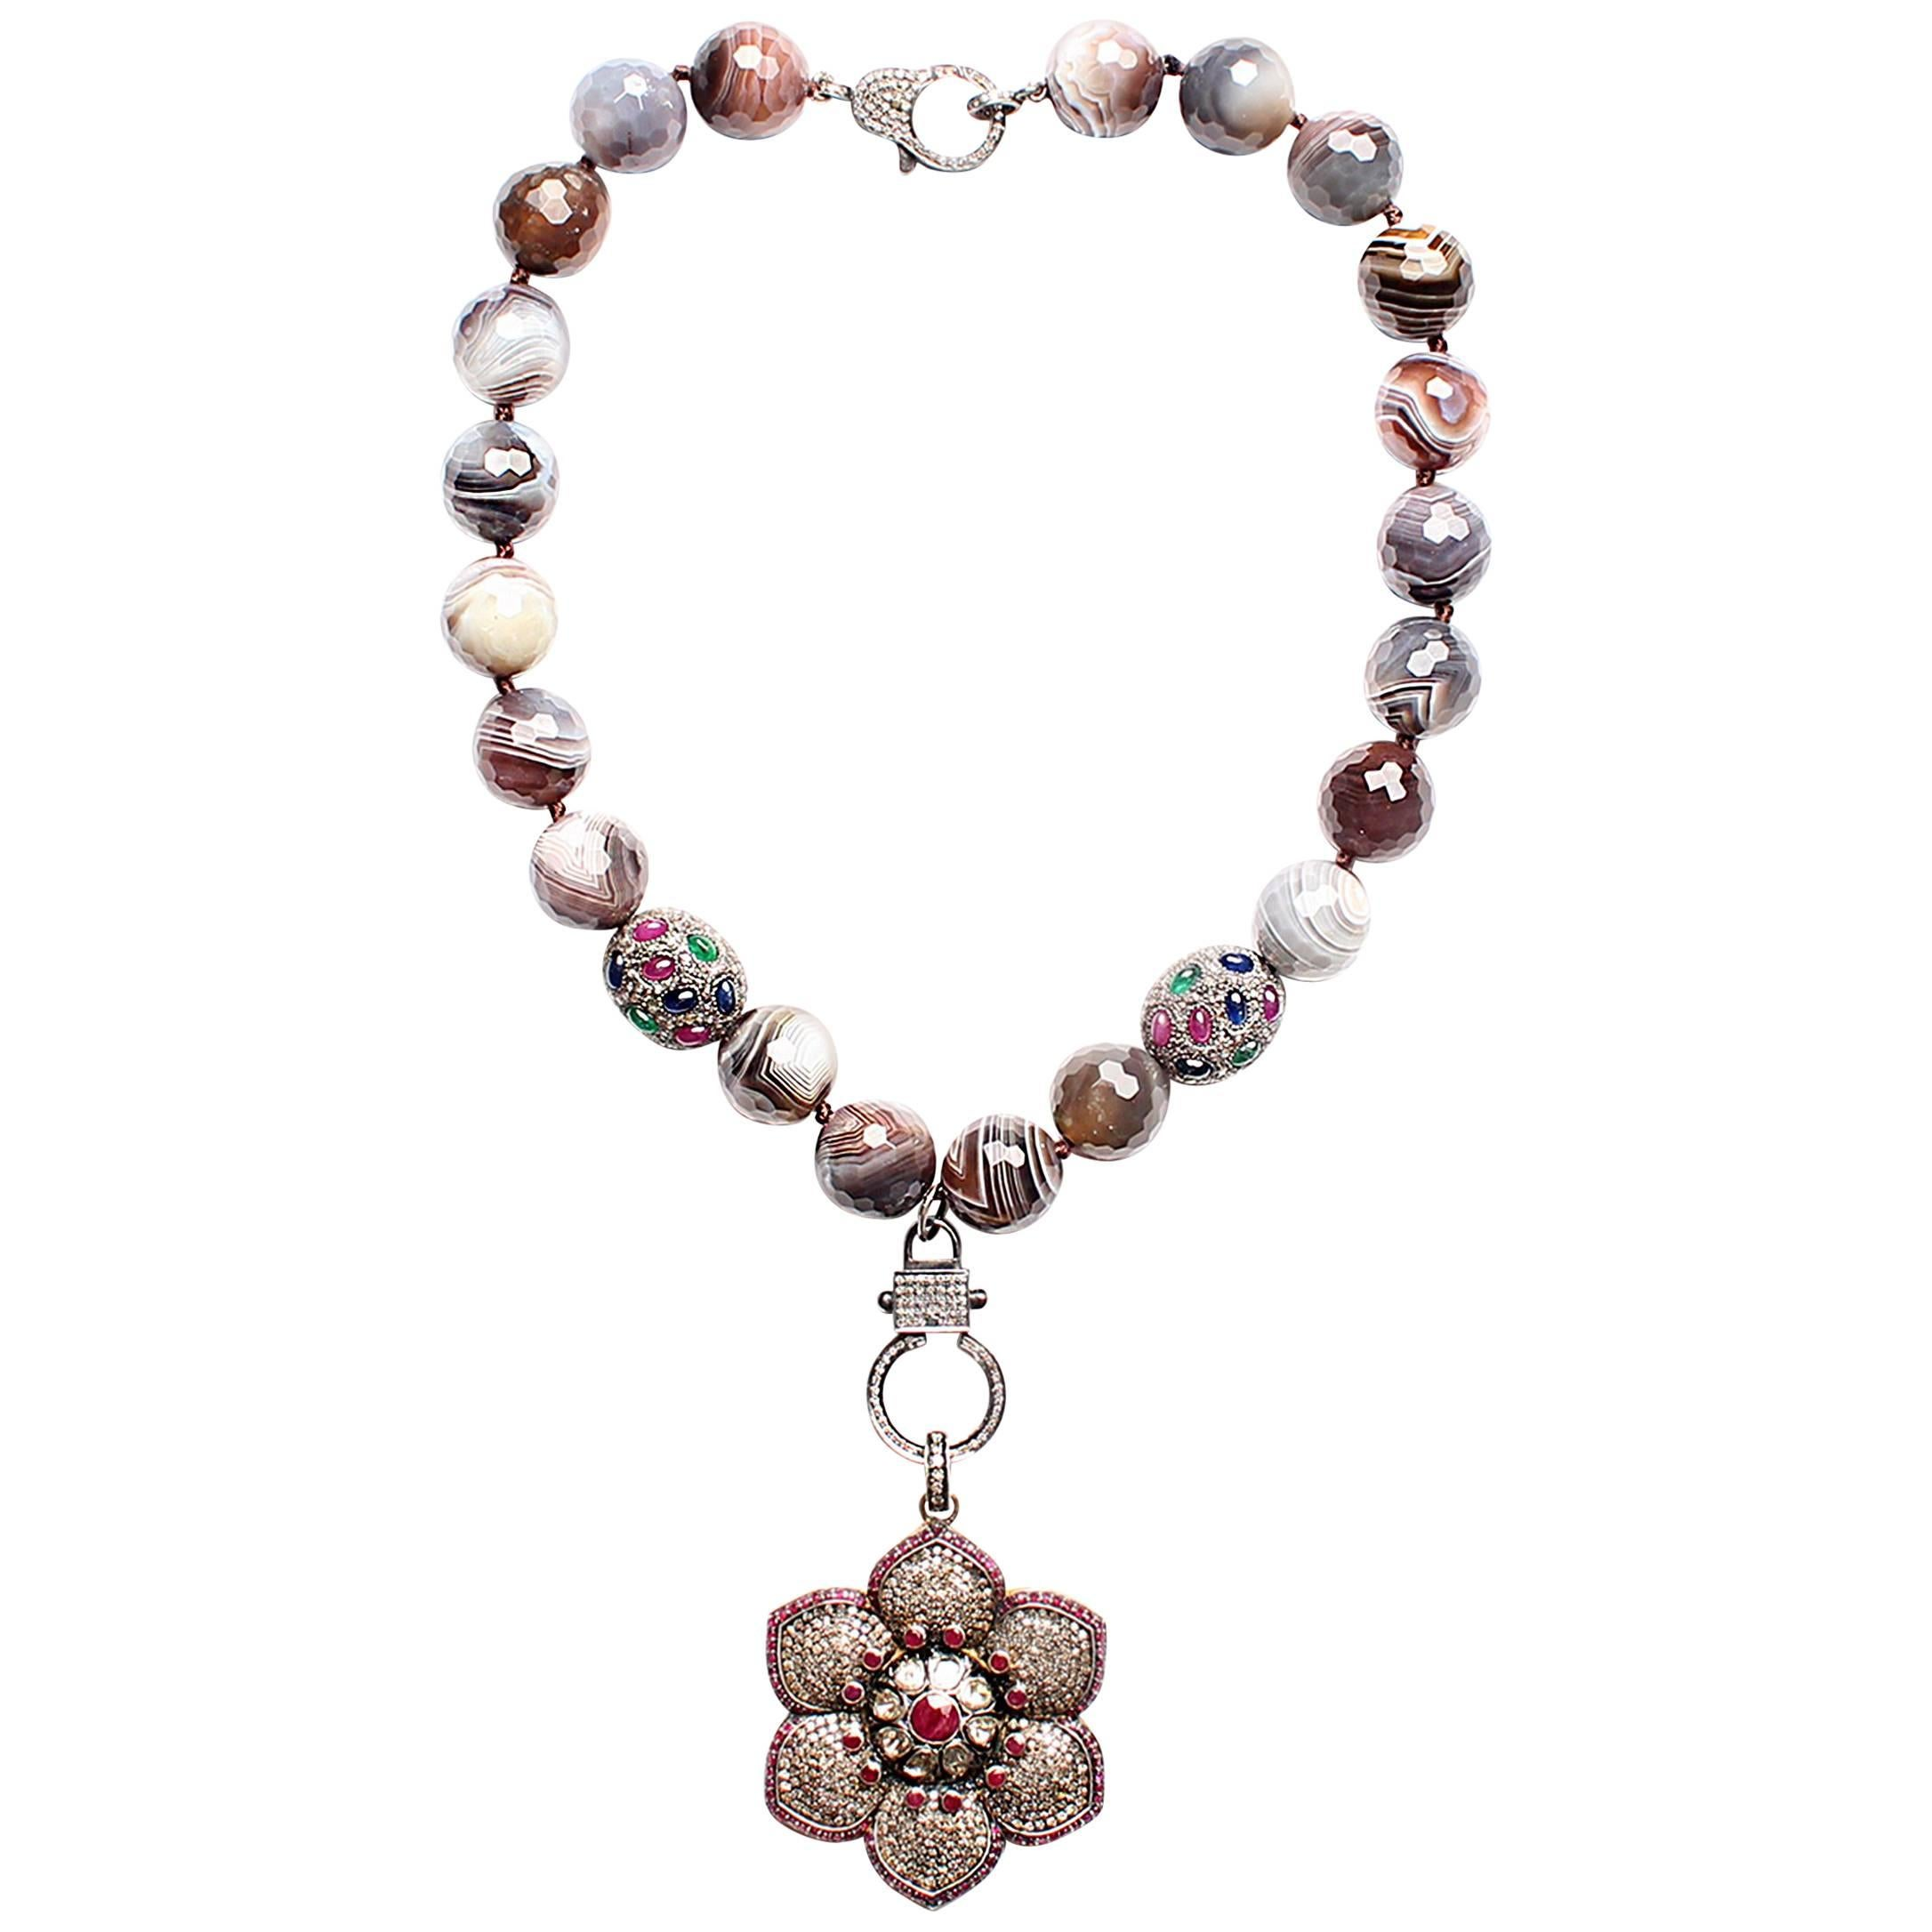 Clarissa Bronfman Botswana Agate, Diamond, Ruby, Emerald, Sapphire Necklace